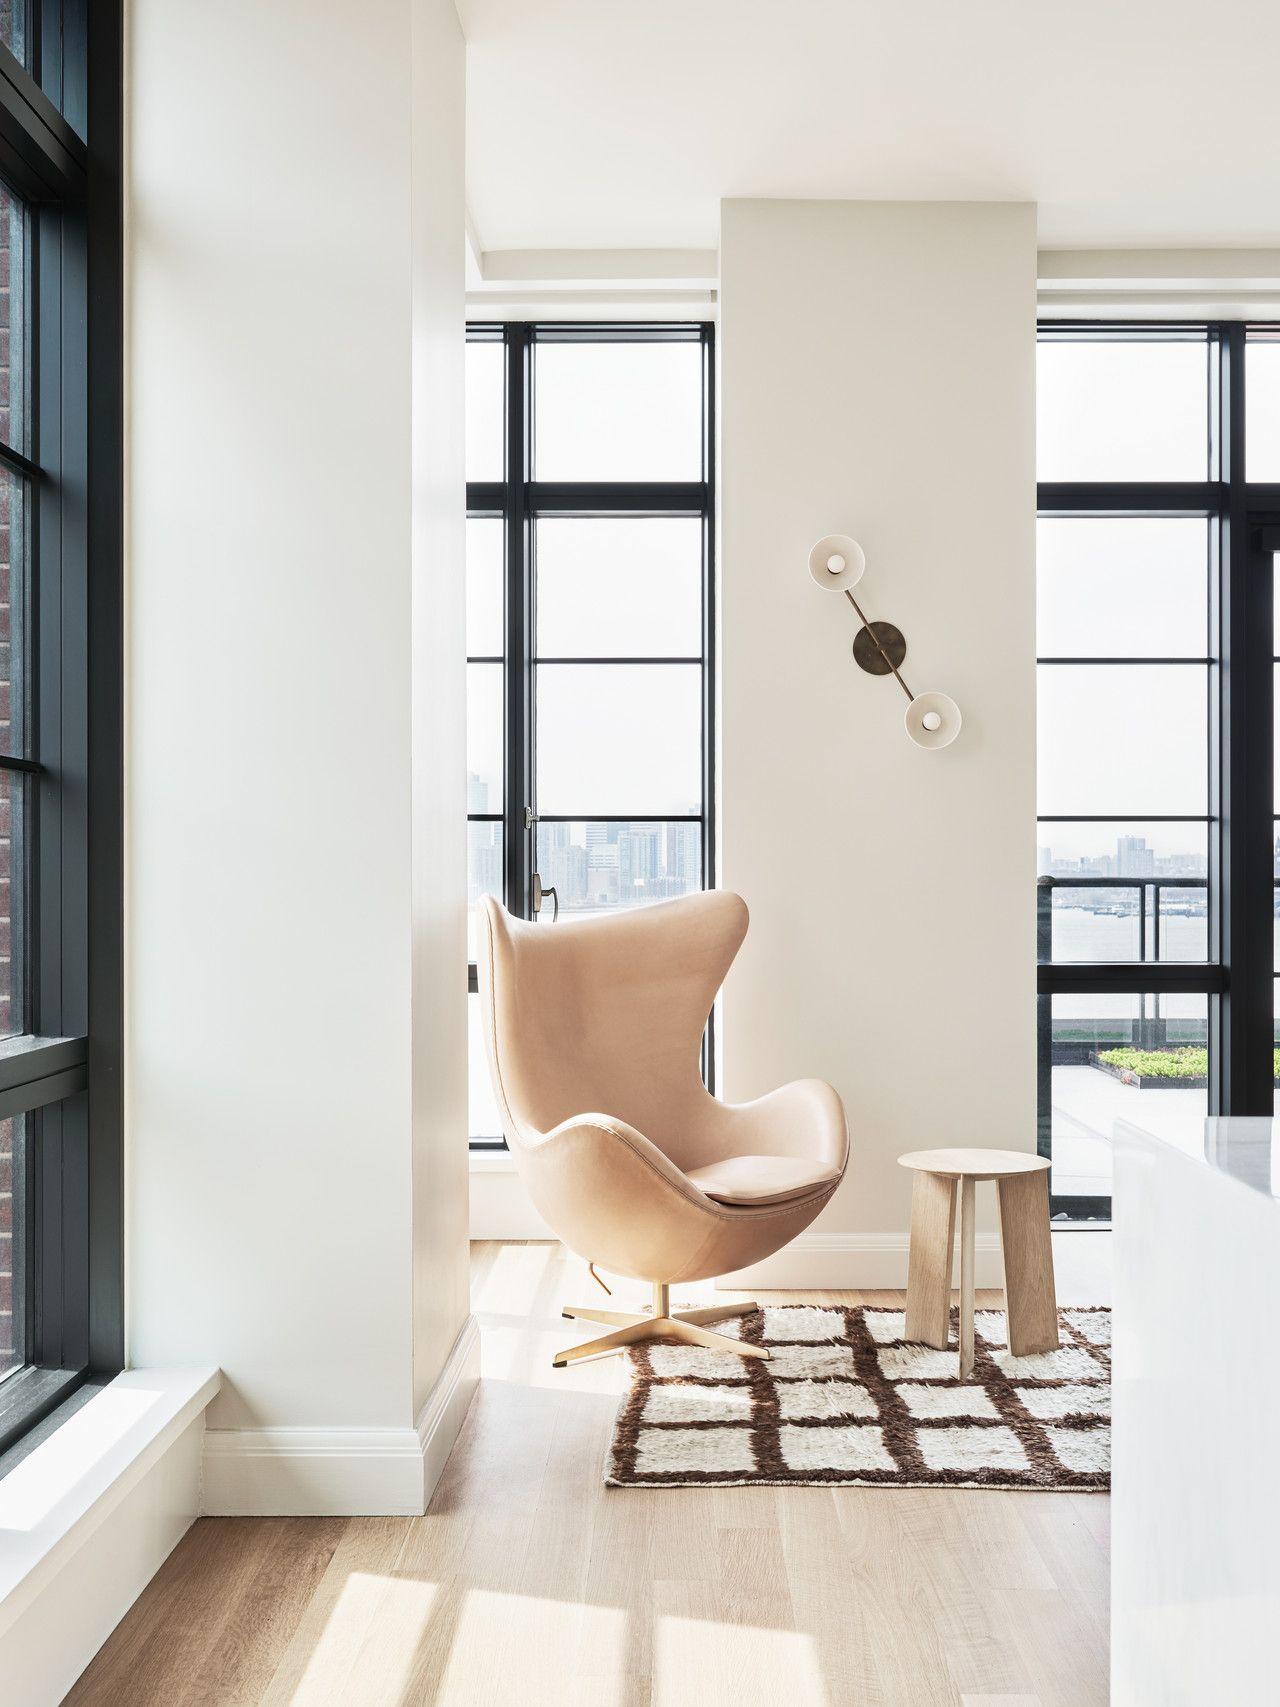 Cheap Furniture Nyc Furnitureinhouston Living Room Scandinavian Furniture Convertible Sofa